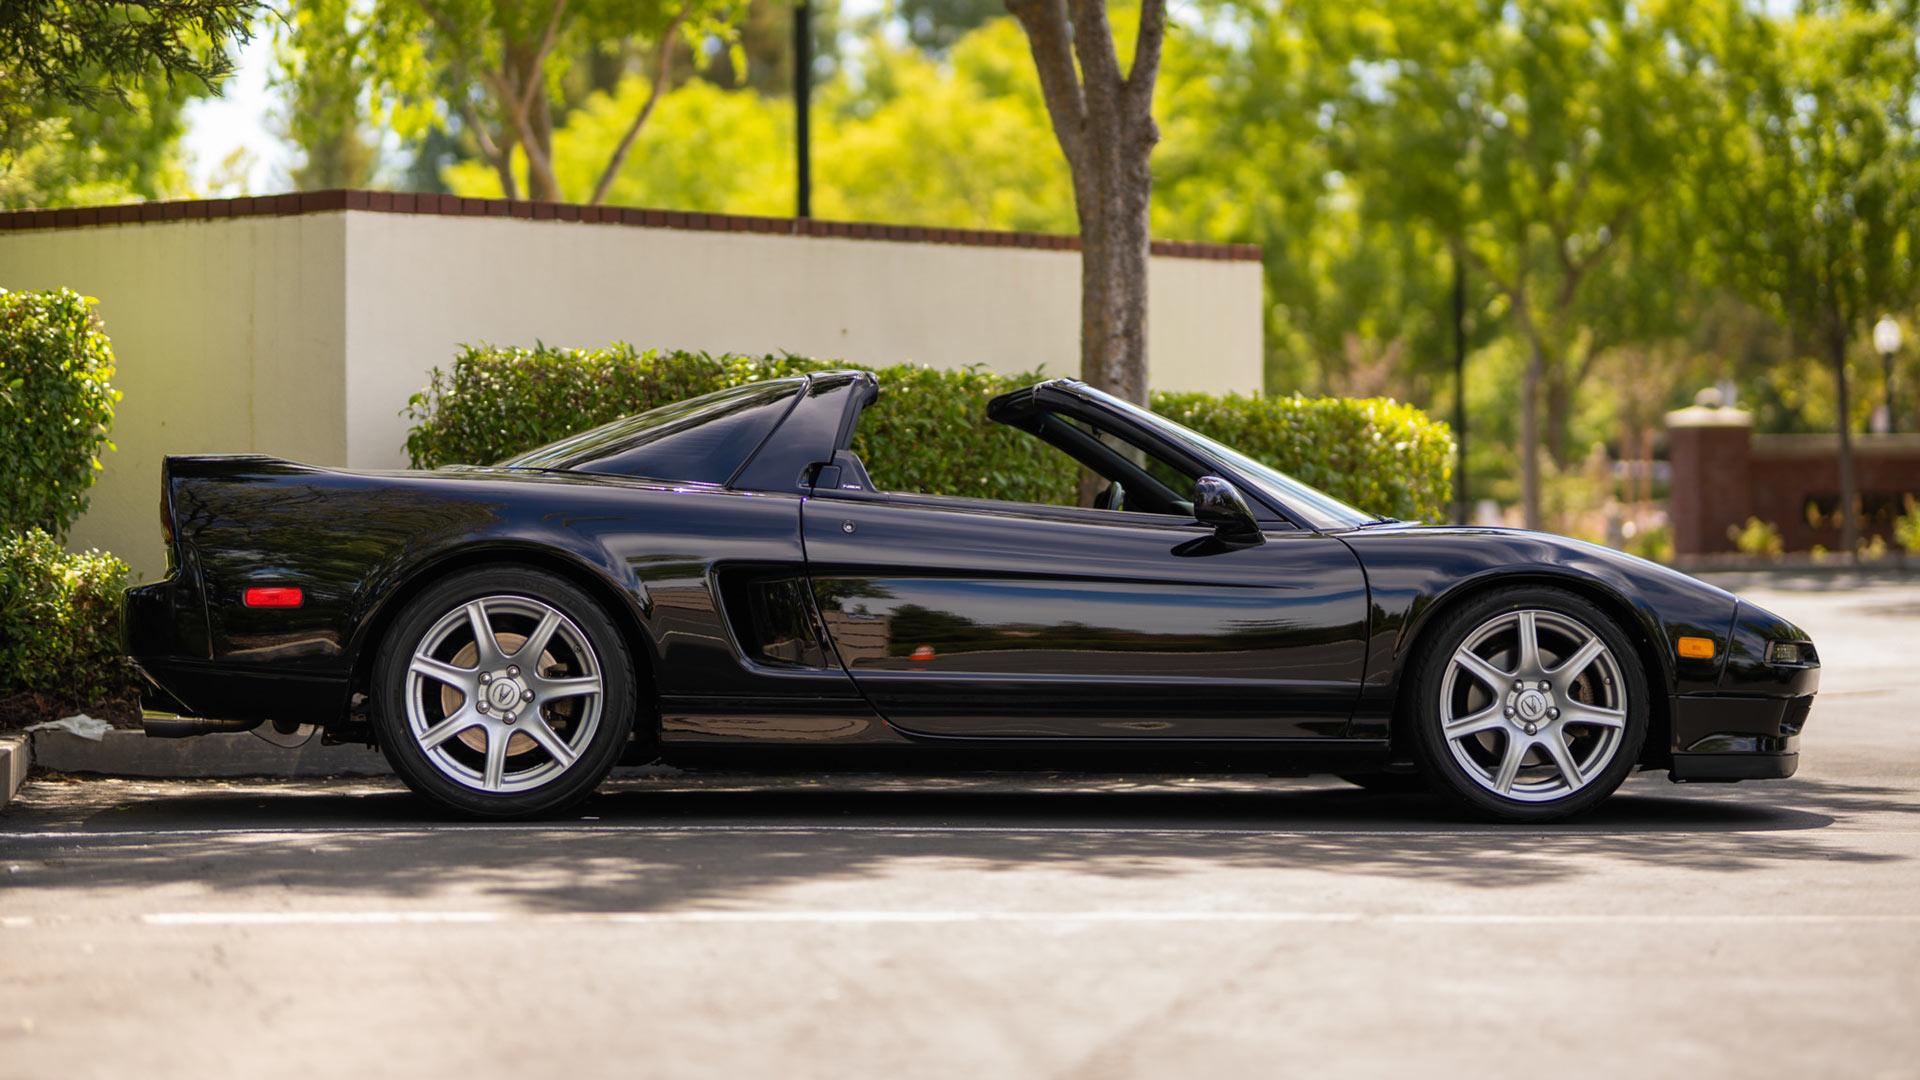 BaT Supercharged 1998 Acura NSX